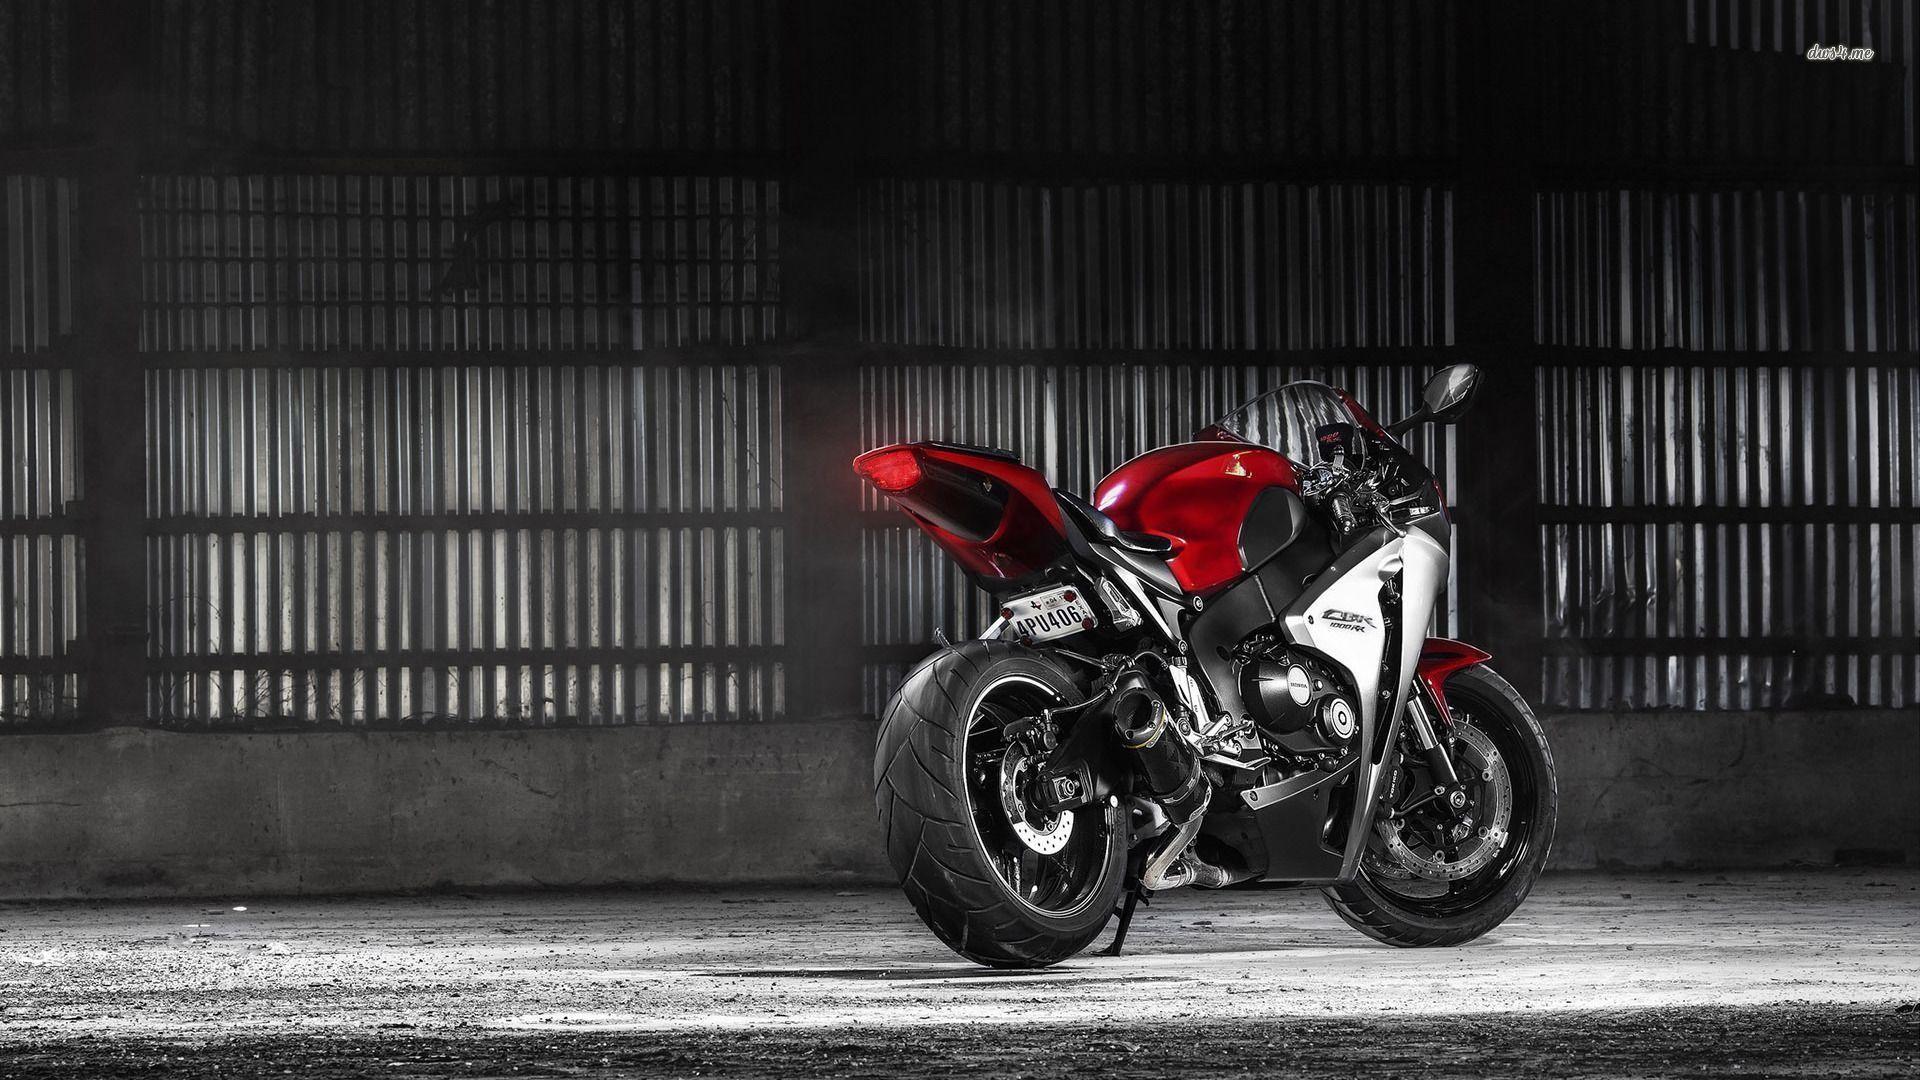 Sportbike Wallpaper HD (65+ Images